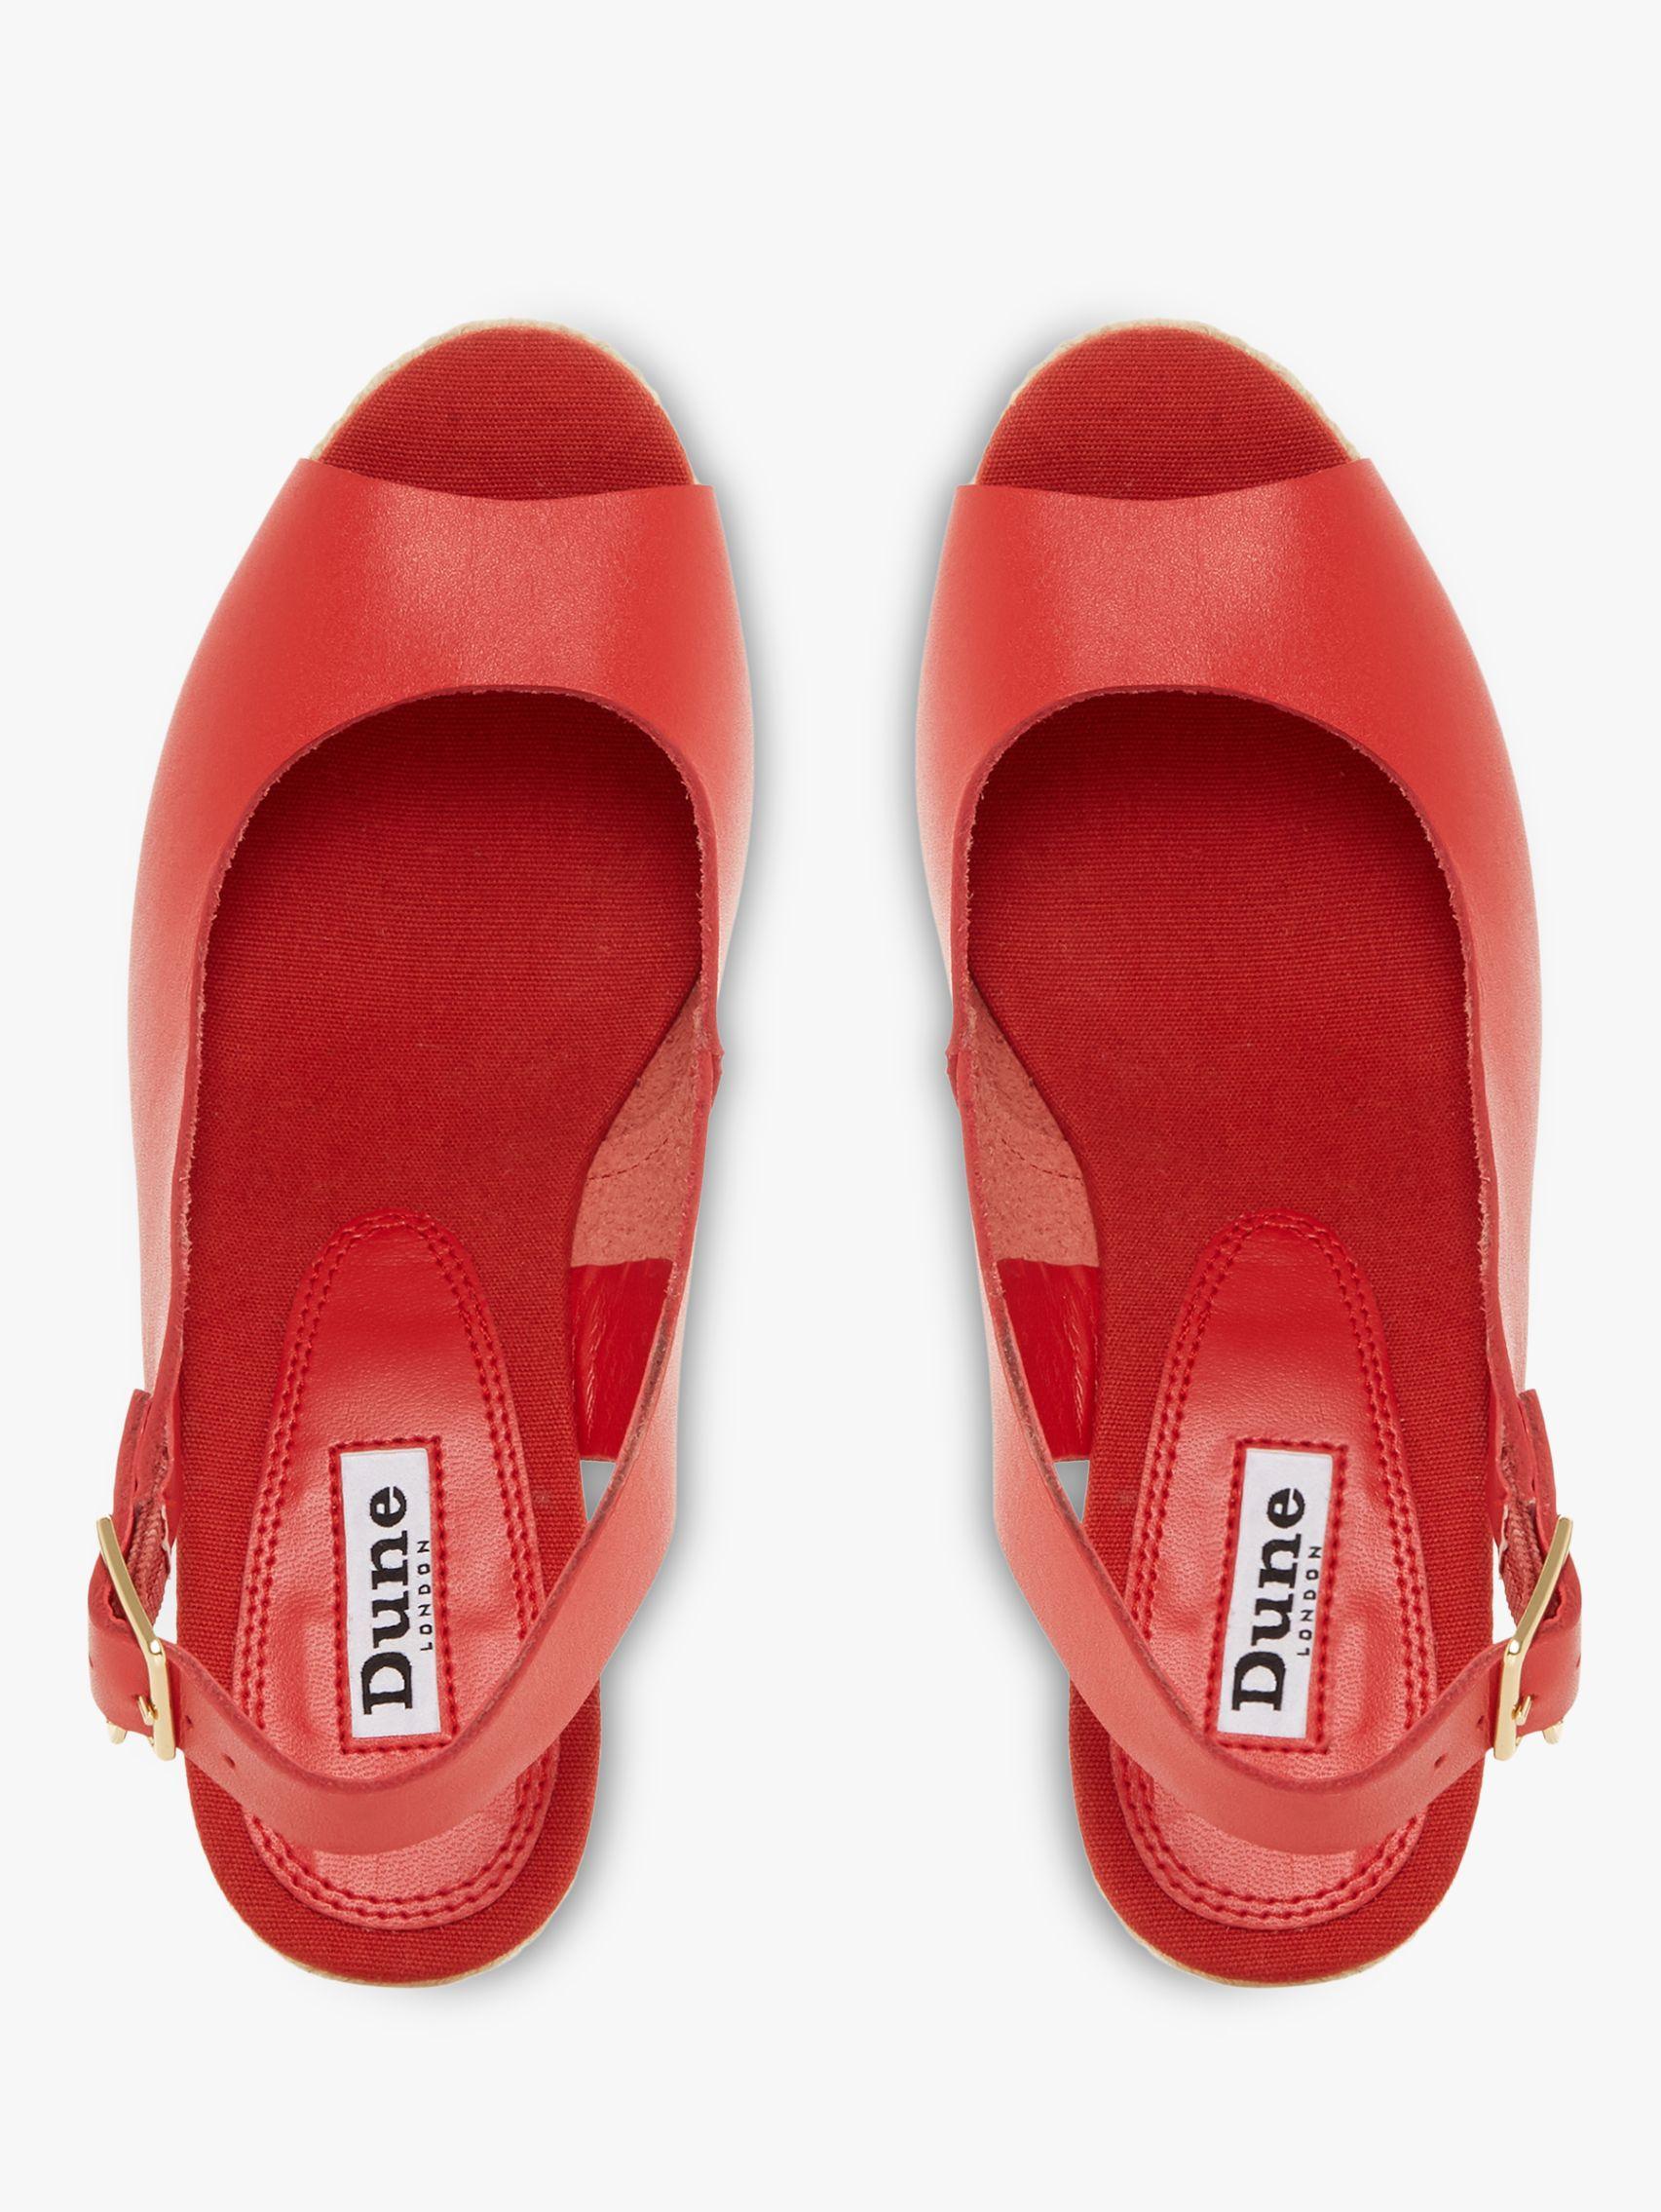 5088e56920ae Dune - Red Klicks Wedge Heel Sandals - Lyst. View fullscreen